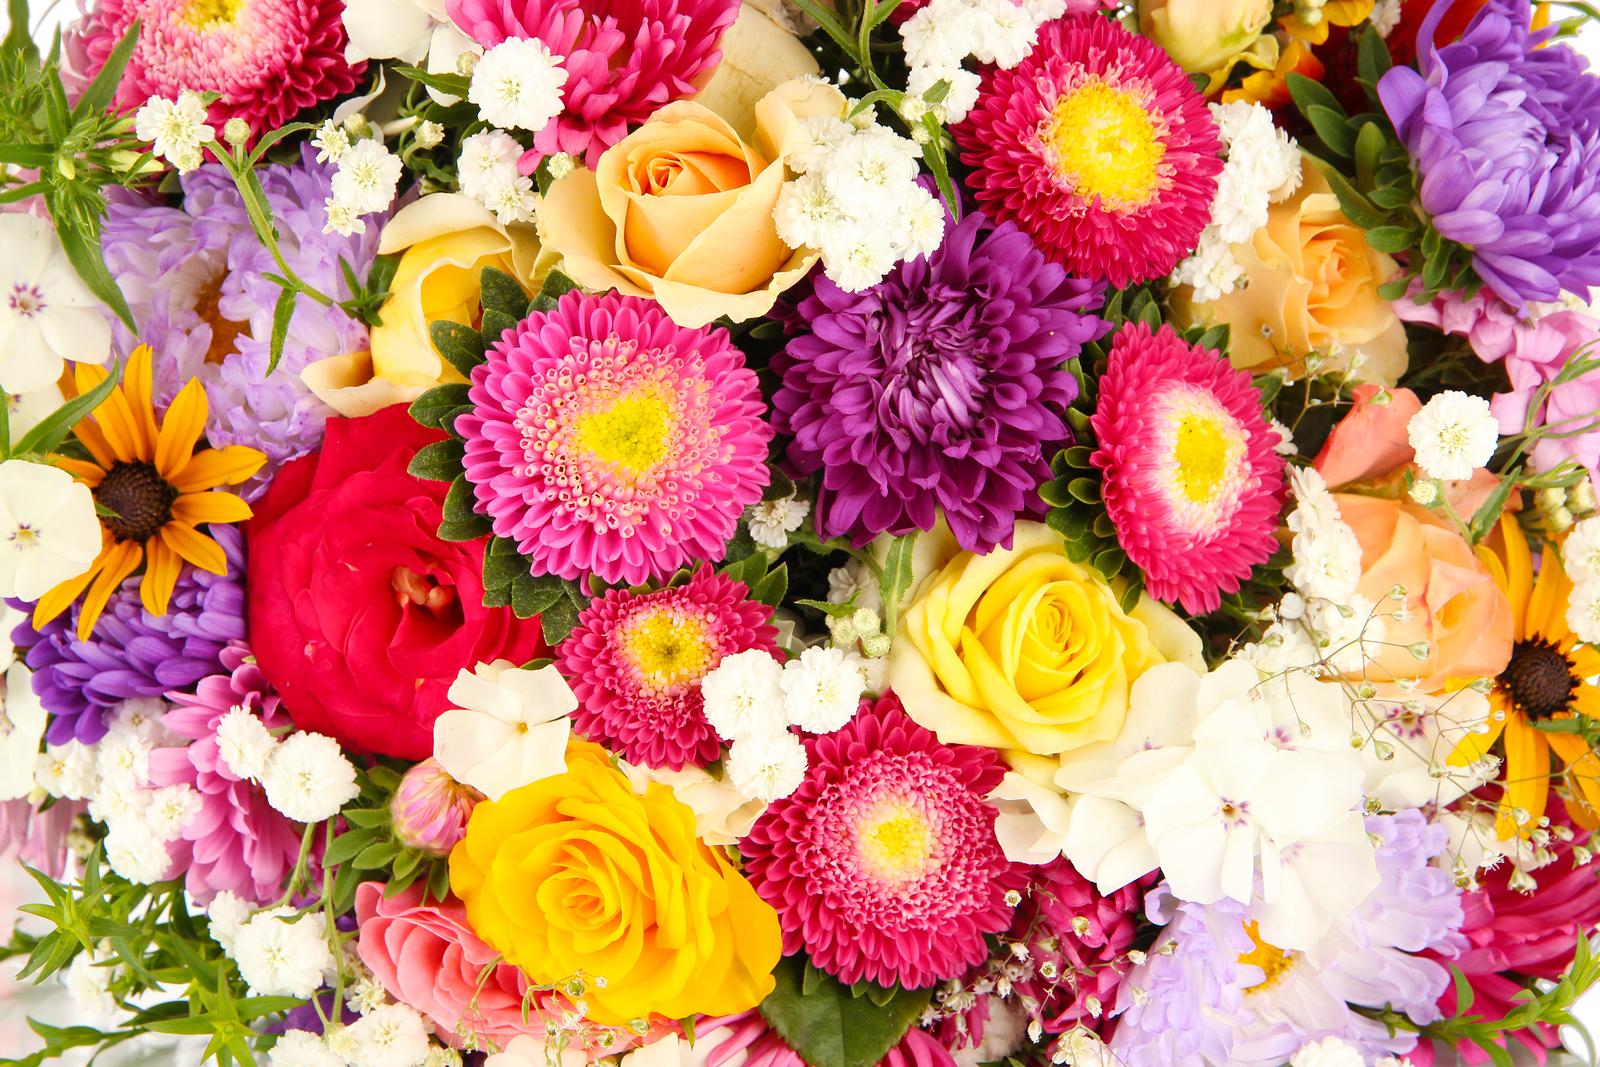 Real flower background images banner freeuse download real flowers background - The Best Flowers Ideas banner freeuse download